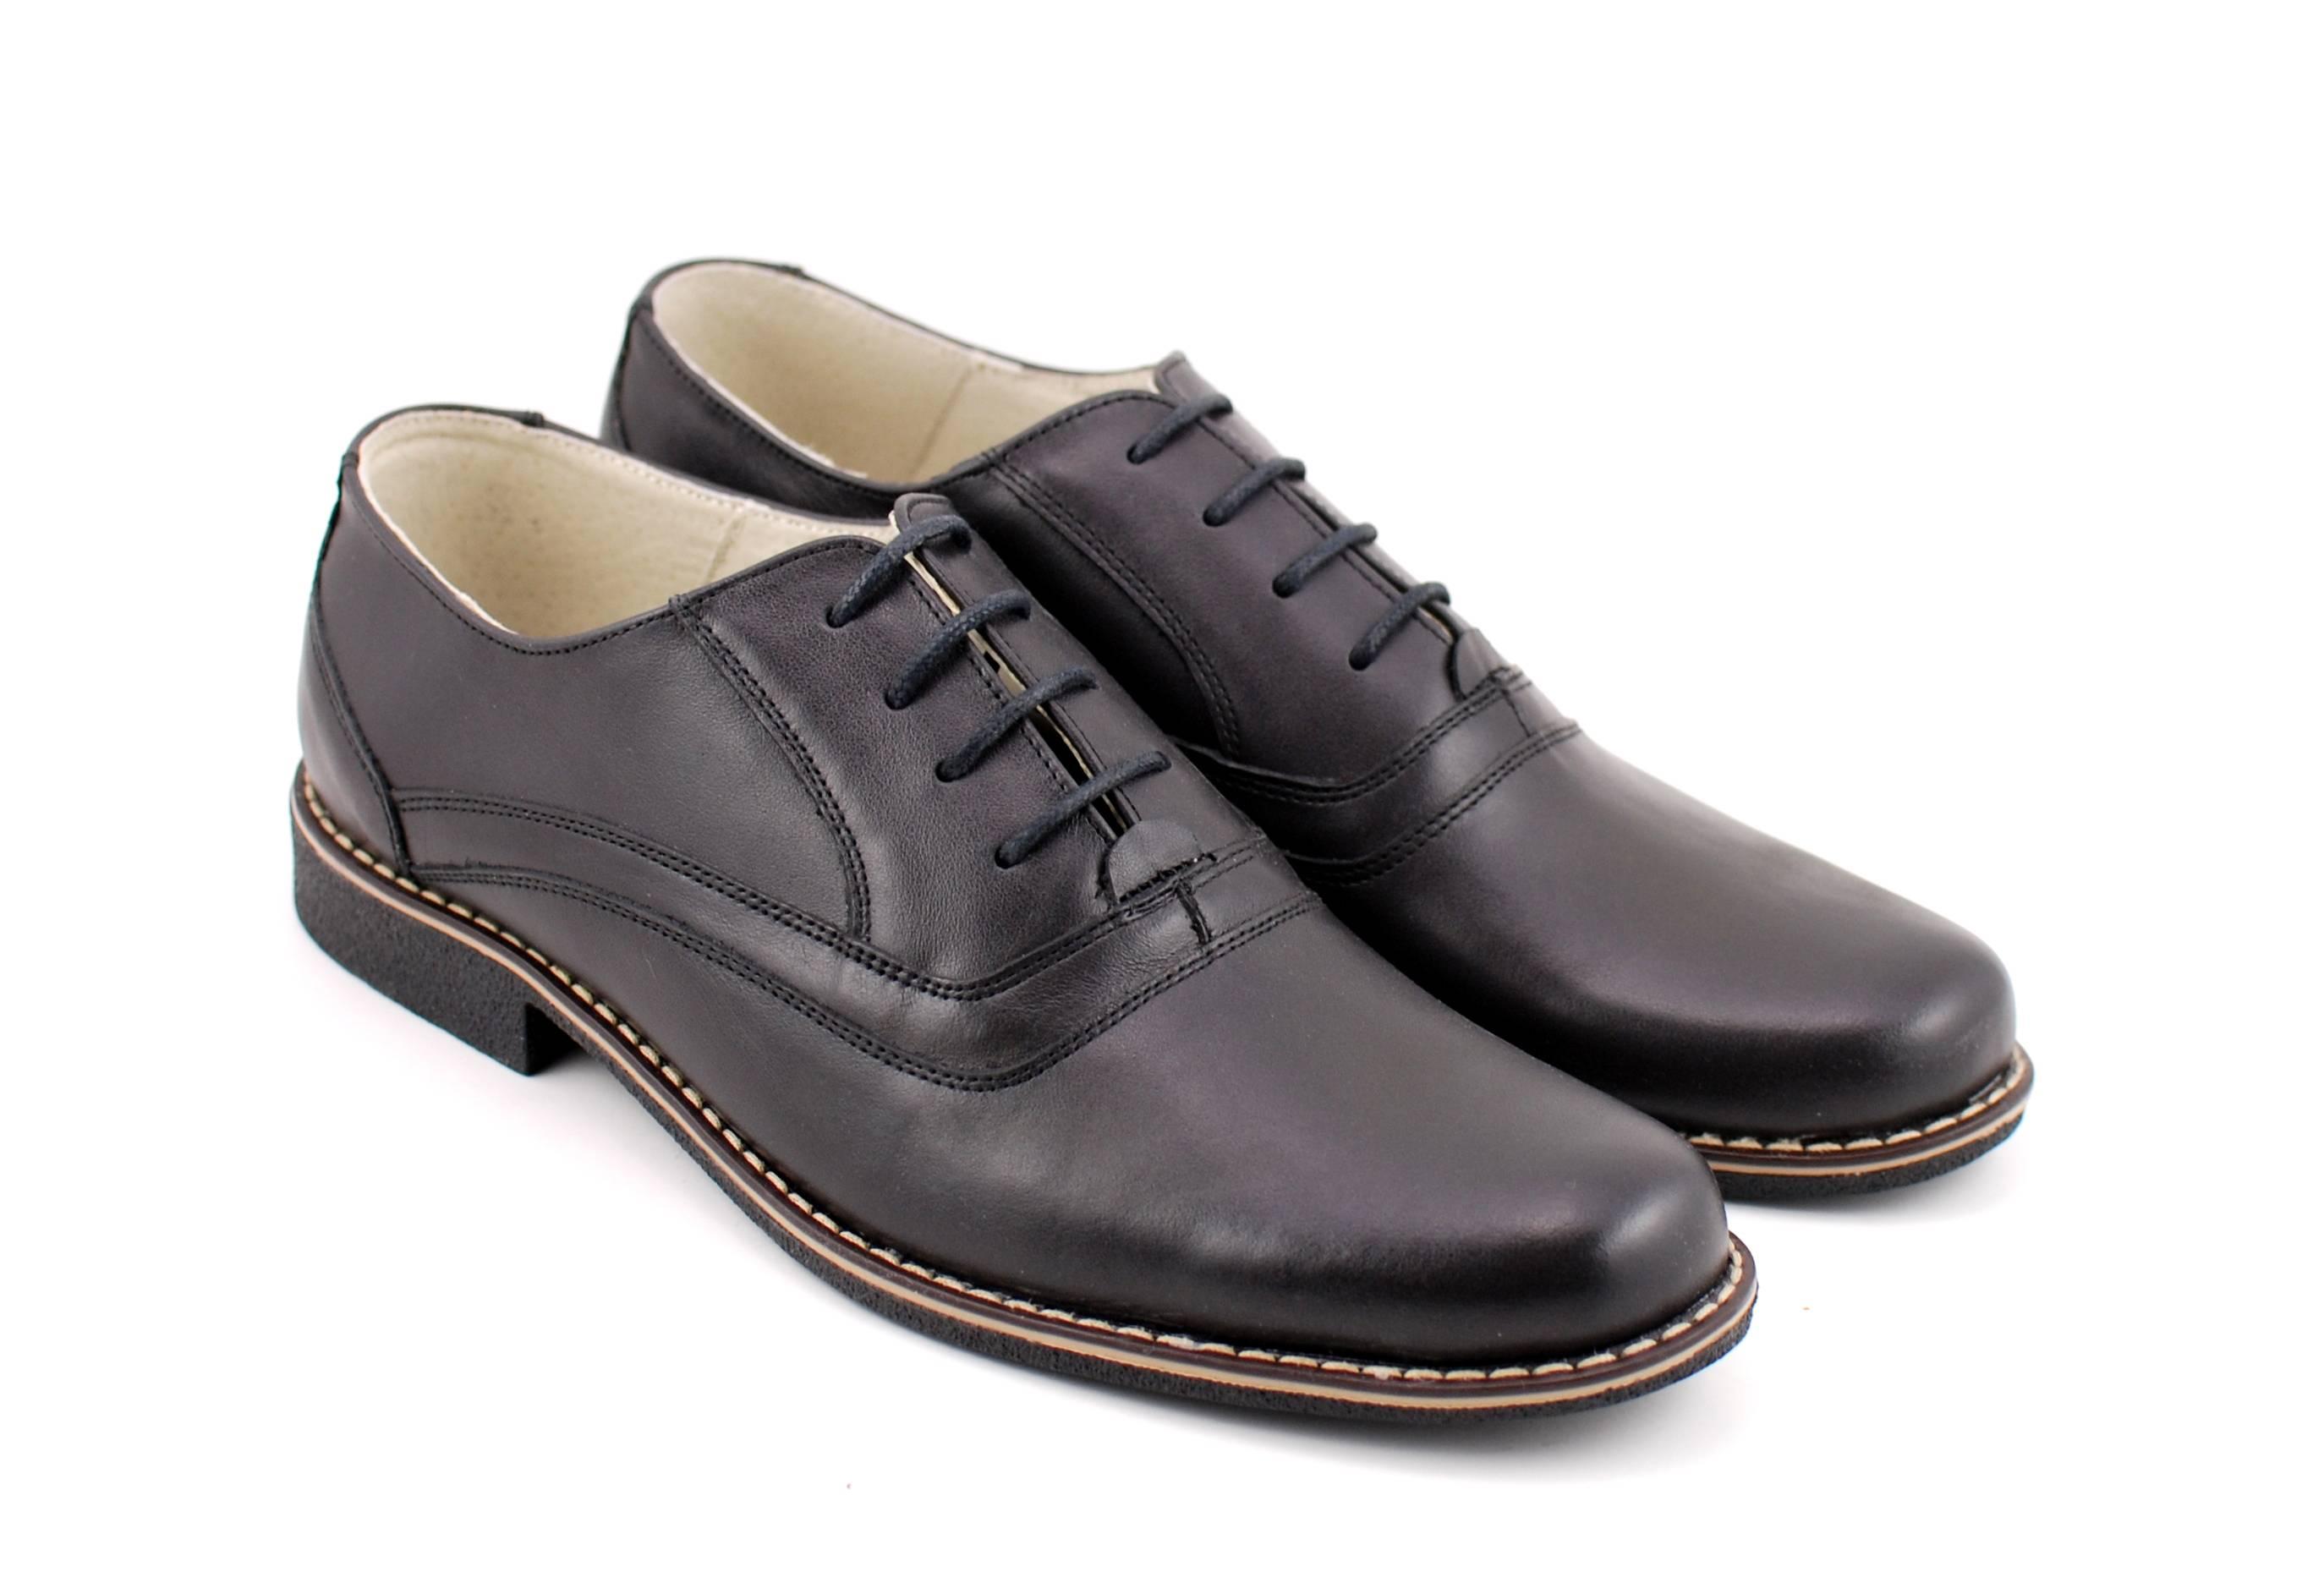 Pantofi barbati casual, eleganti din piele naturala P37NN